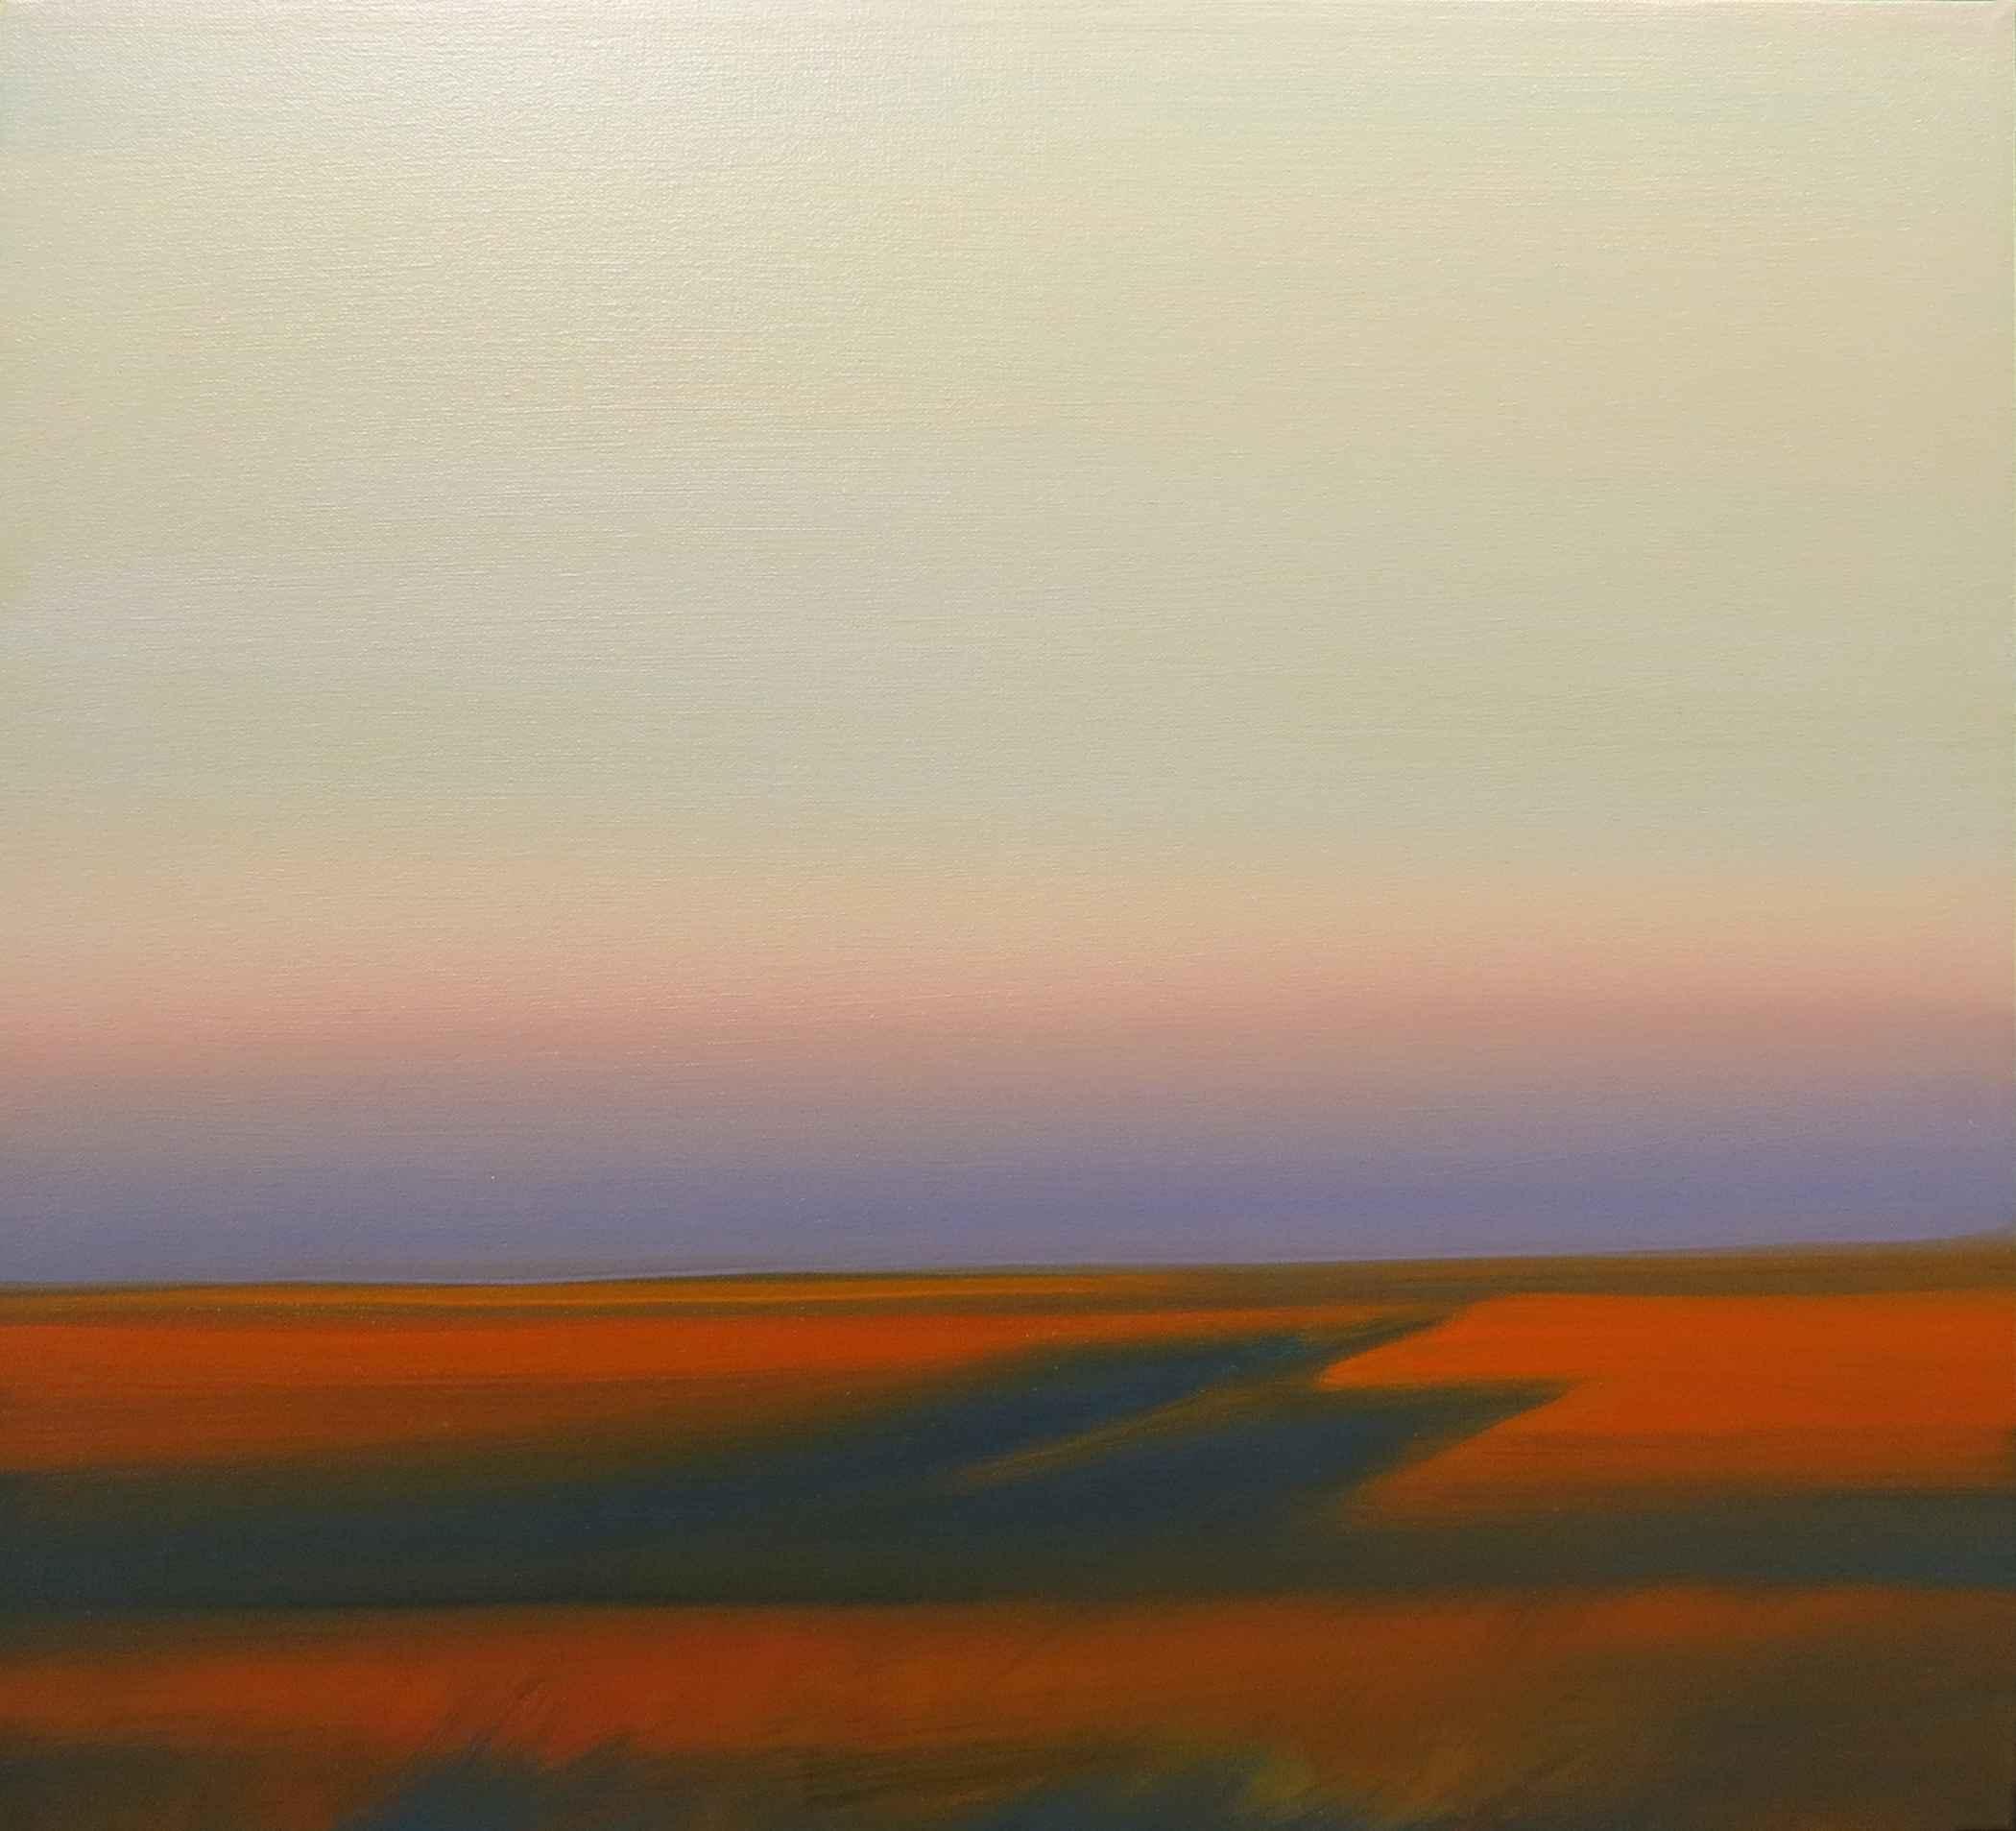 Orange Hills and Eart... by  Lisa Grossman - Masterpiece Online